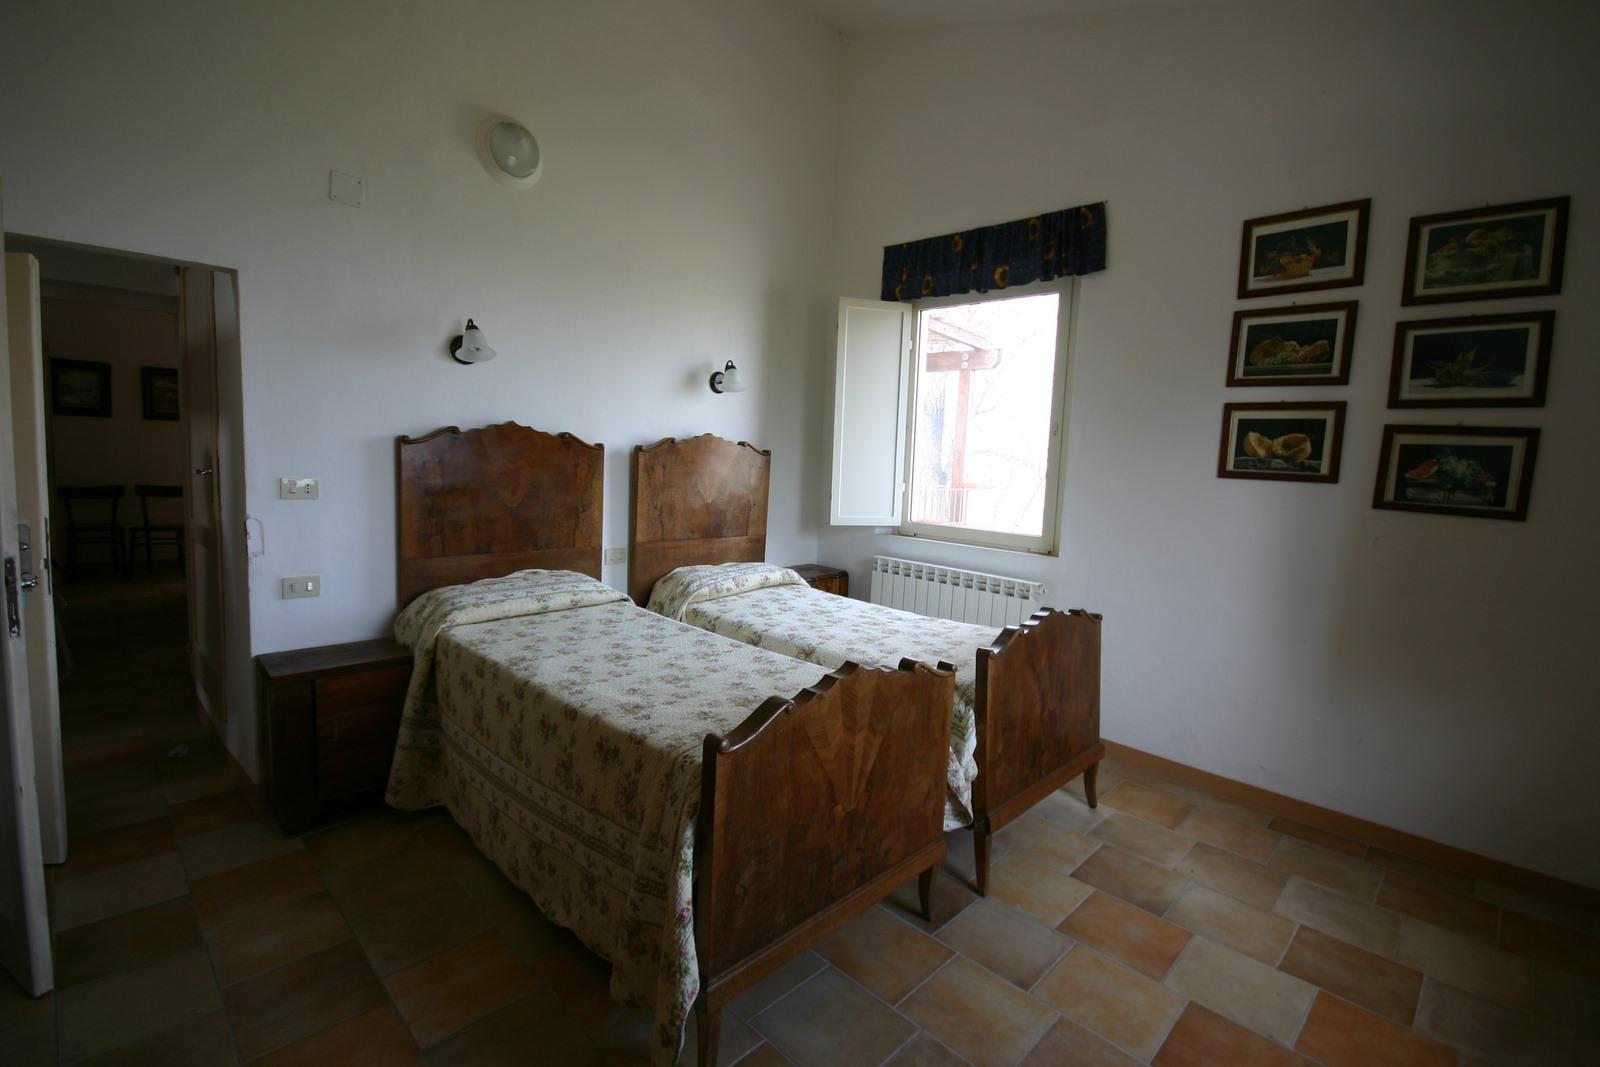 Ferienwohnung Podere Paolo-Terrazzo (870415), Fermo, Fermo, Marken, Italien, Bild 16